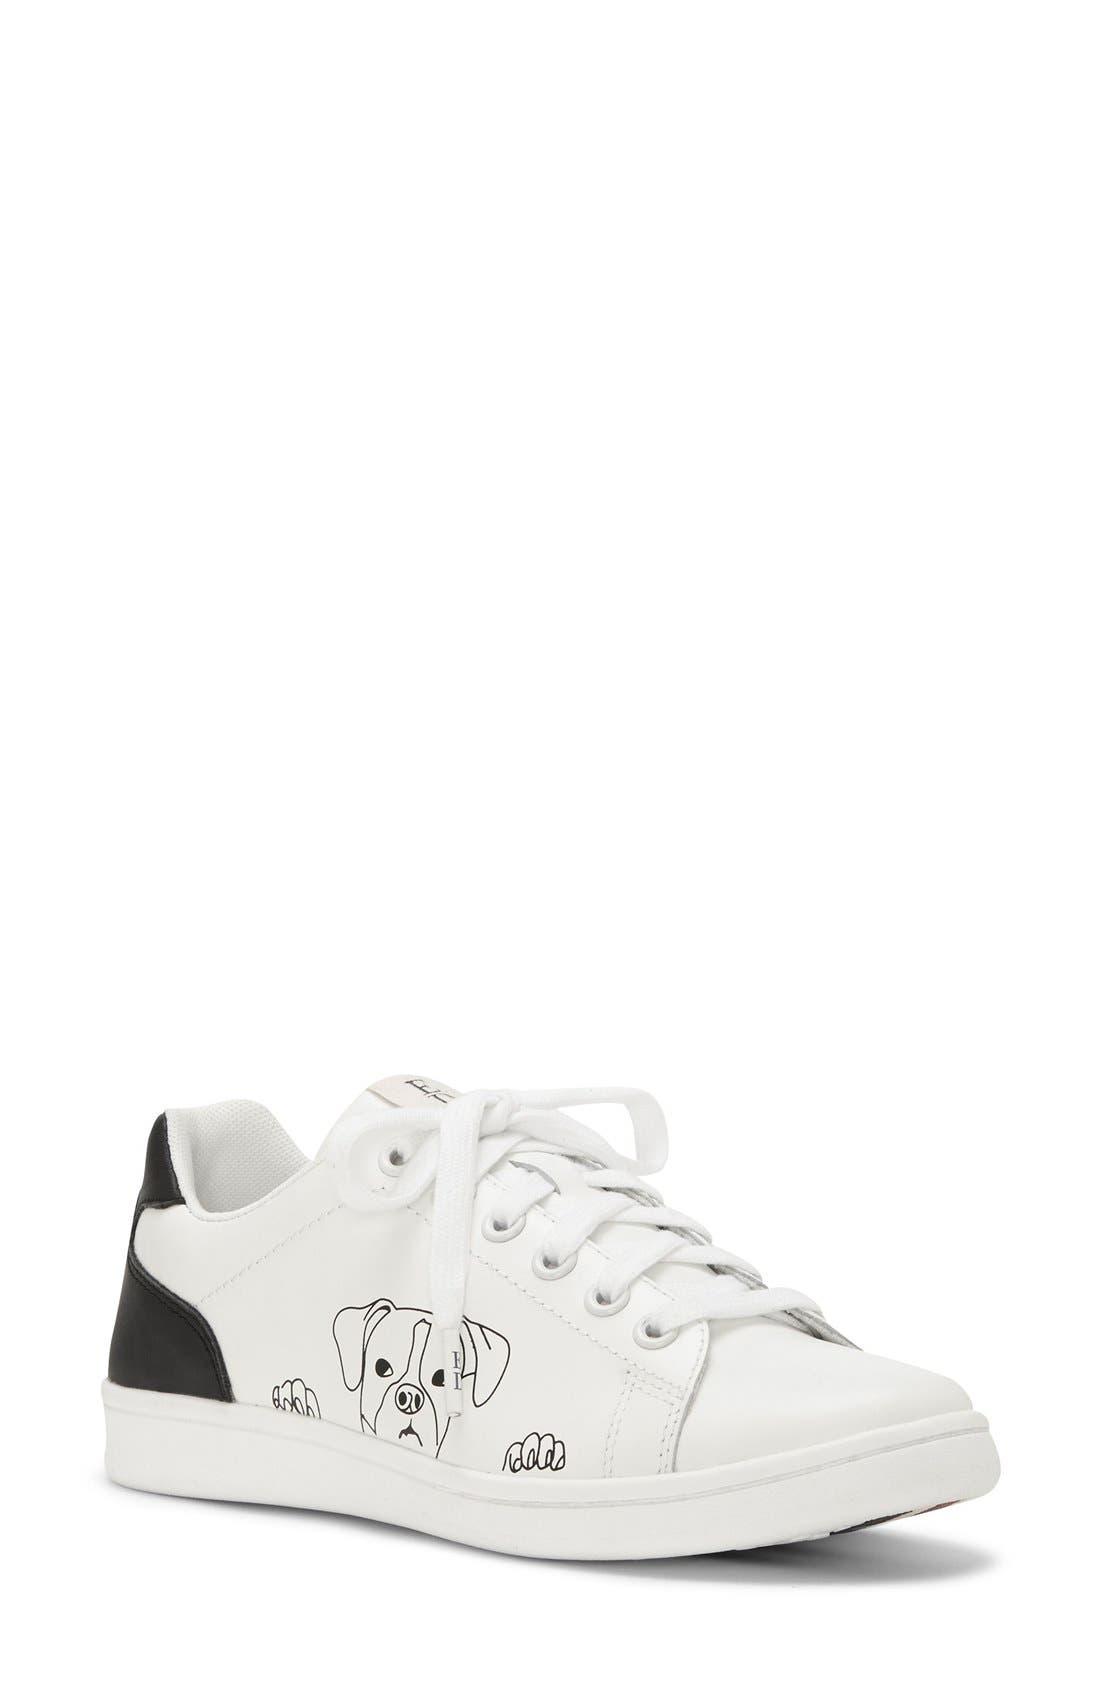 ED Ellen DeGeneres Chapanima Sneaker (Women's) qTZjzJ4XWl